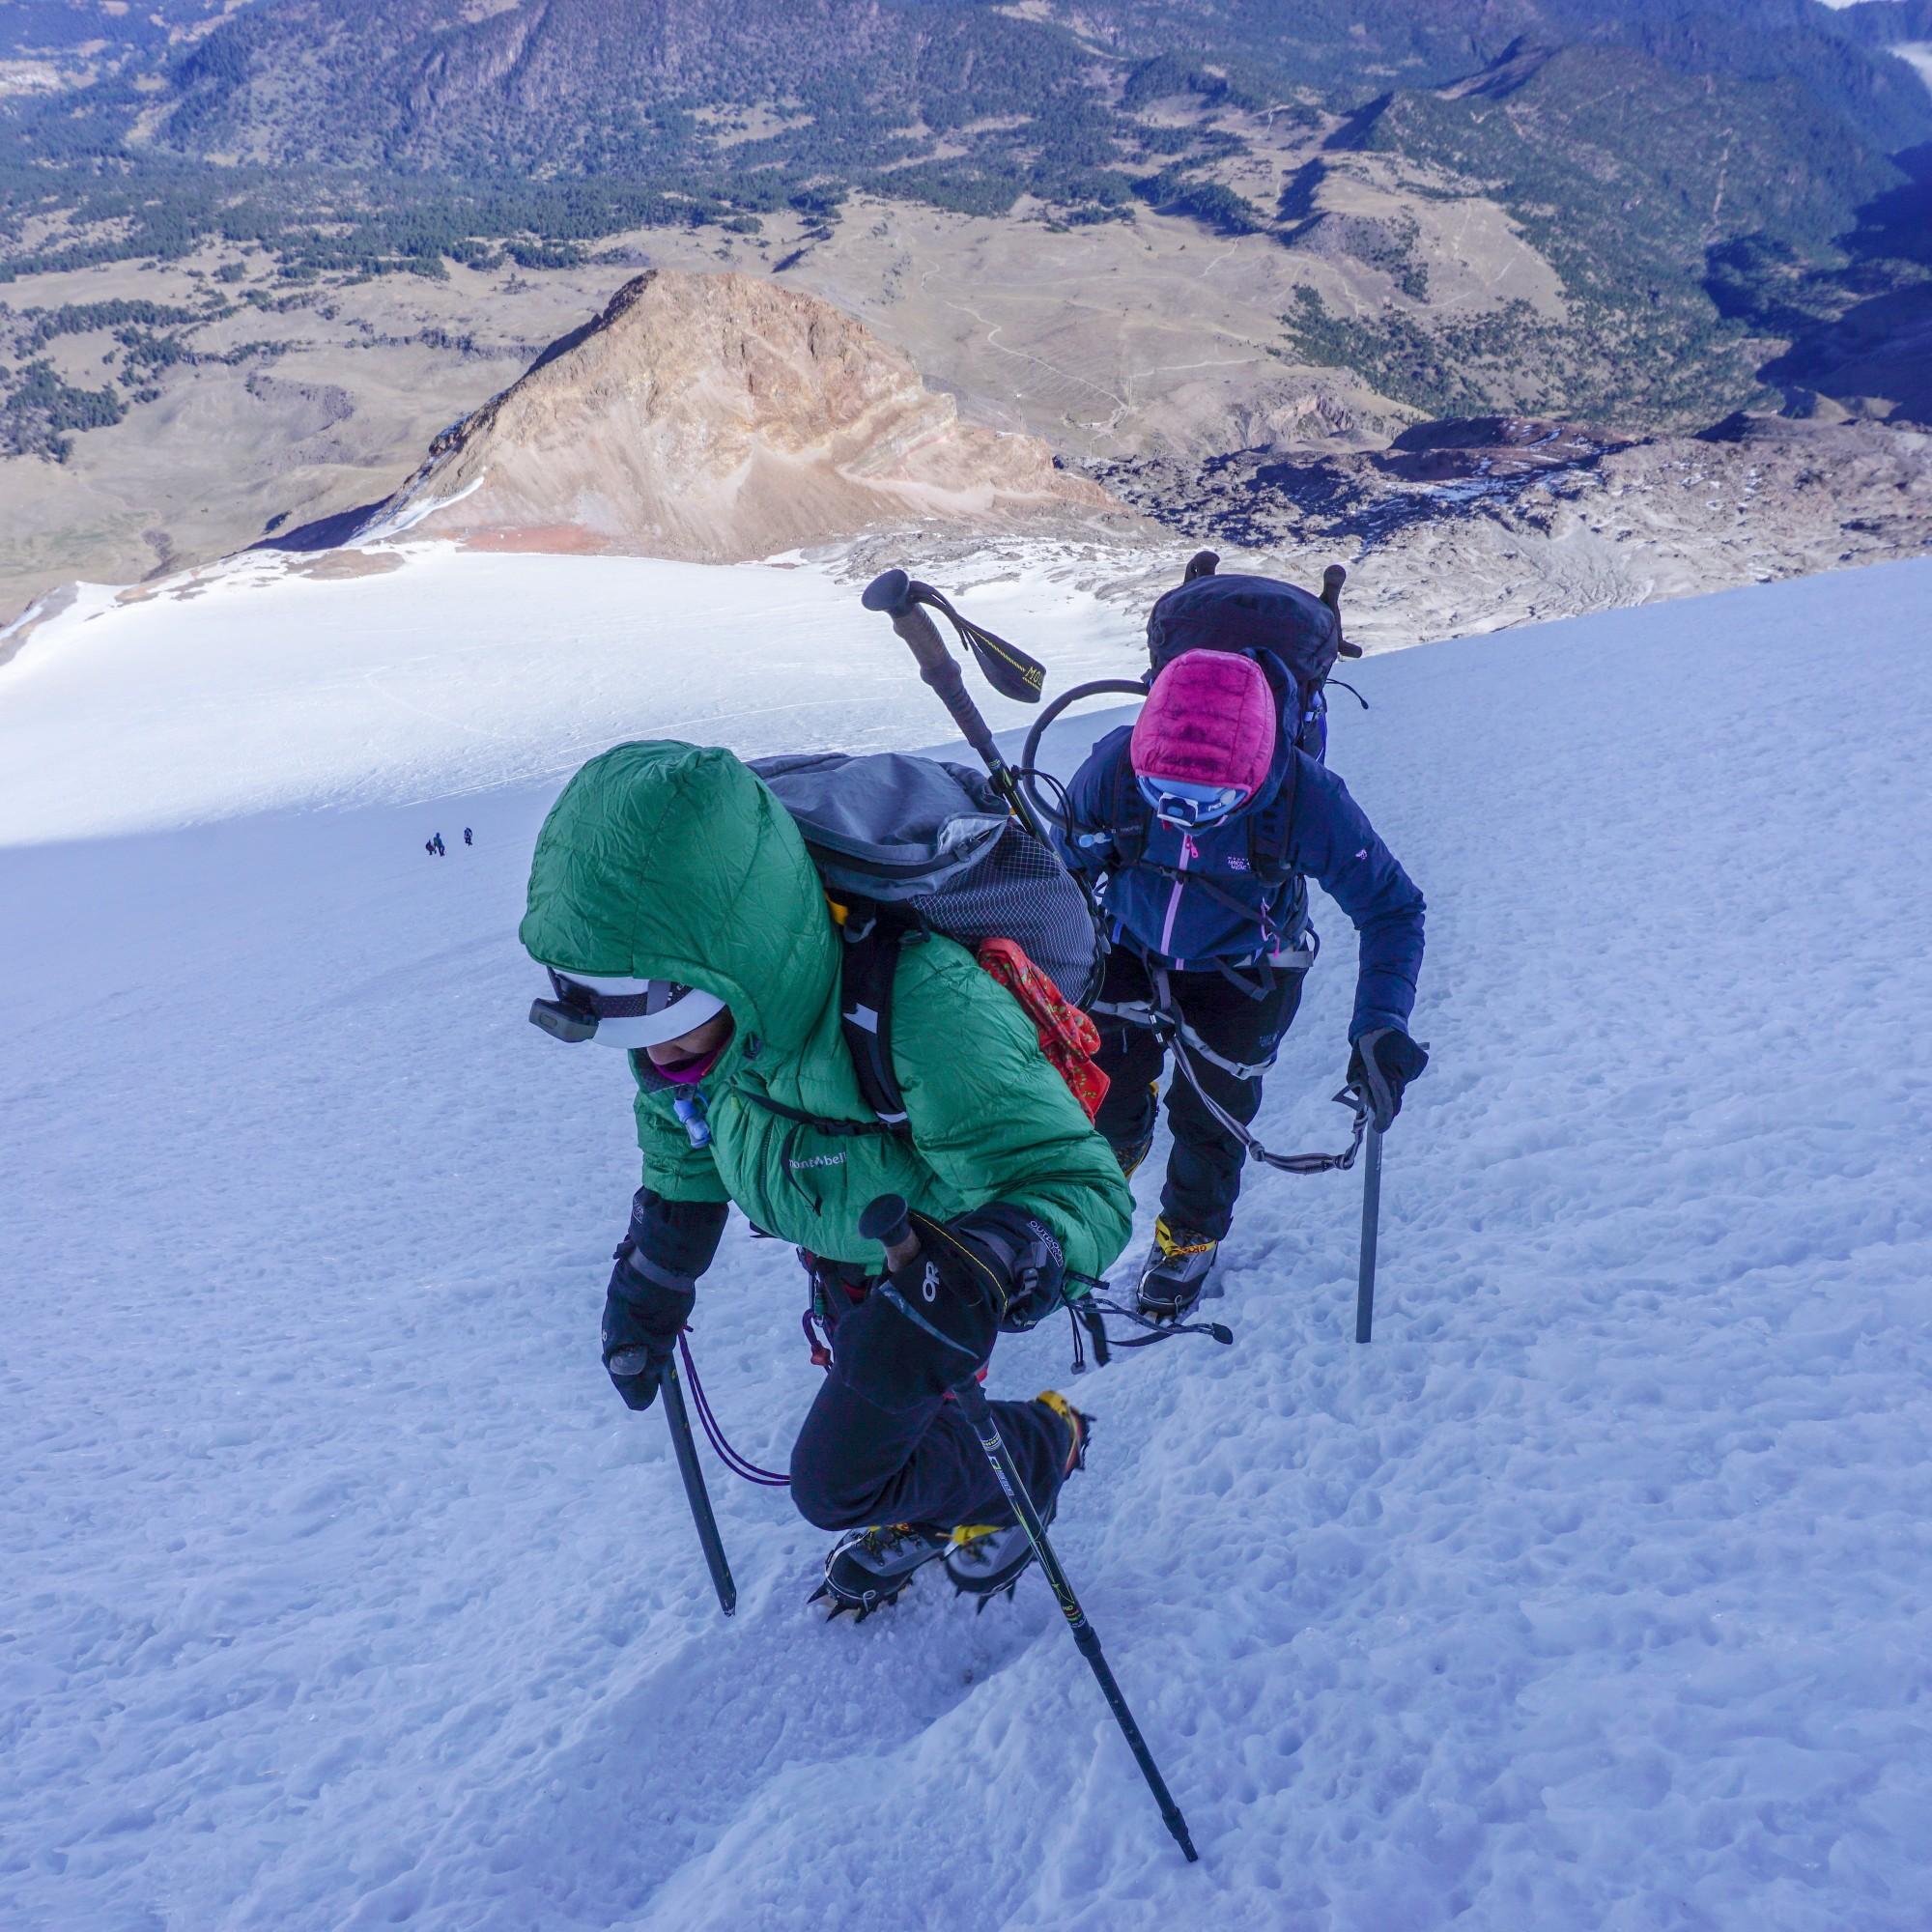 Rebecca climbing Pico de Orizaba snowy pic.JPG